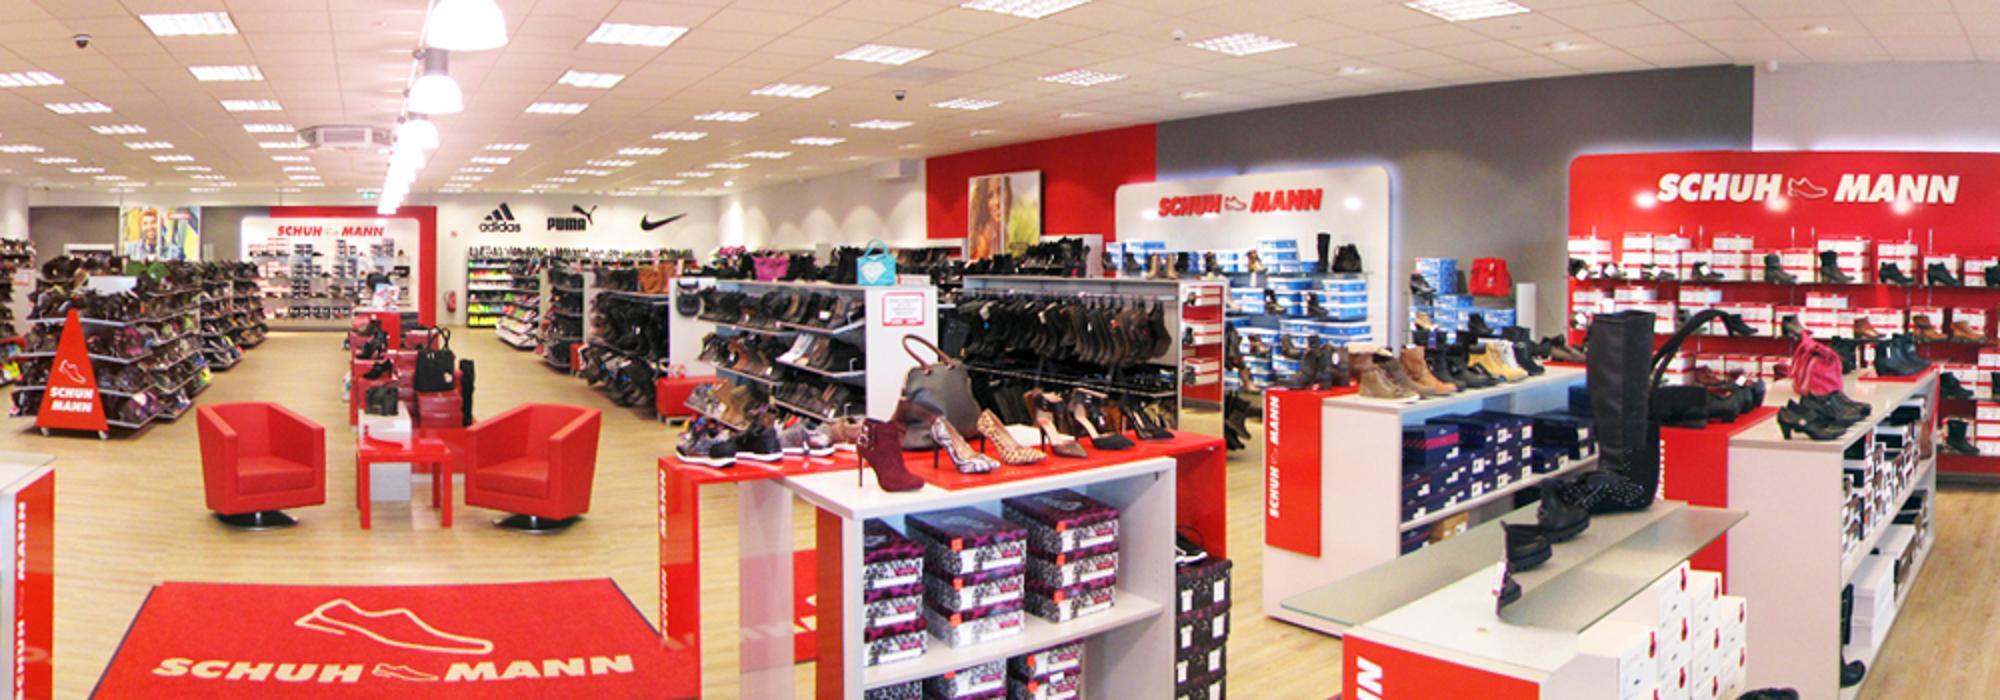 Schuh Mann • Remseck am Neckar, Neckaraue 2 Öffnungszeiten